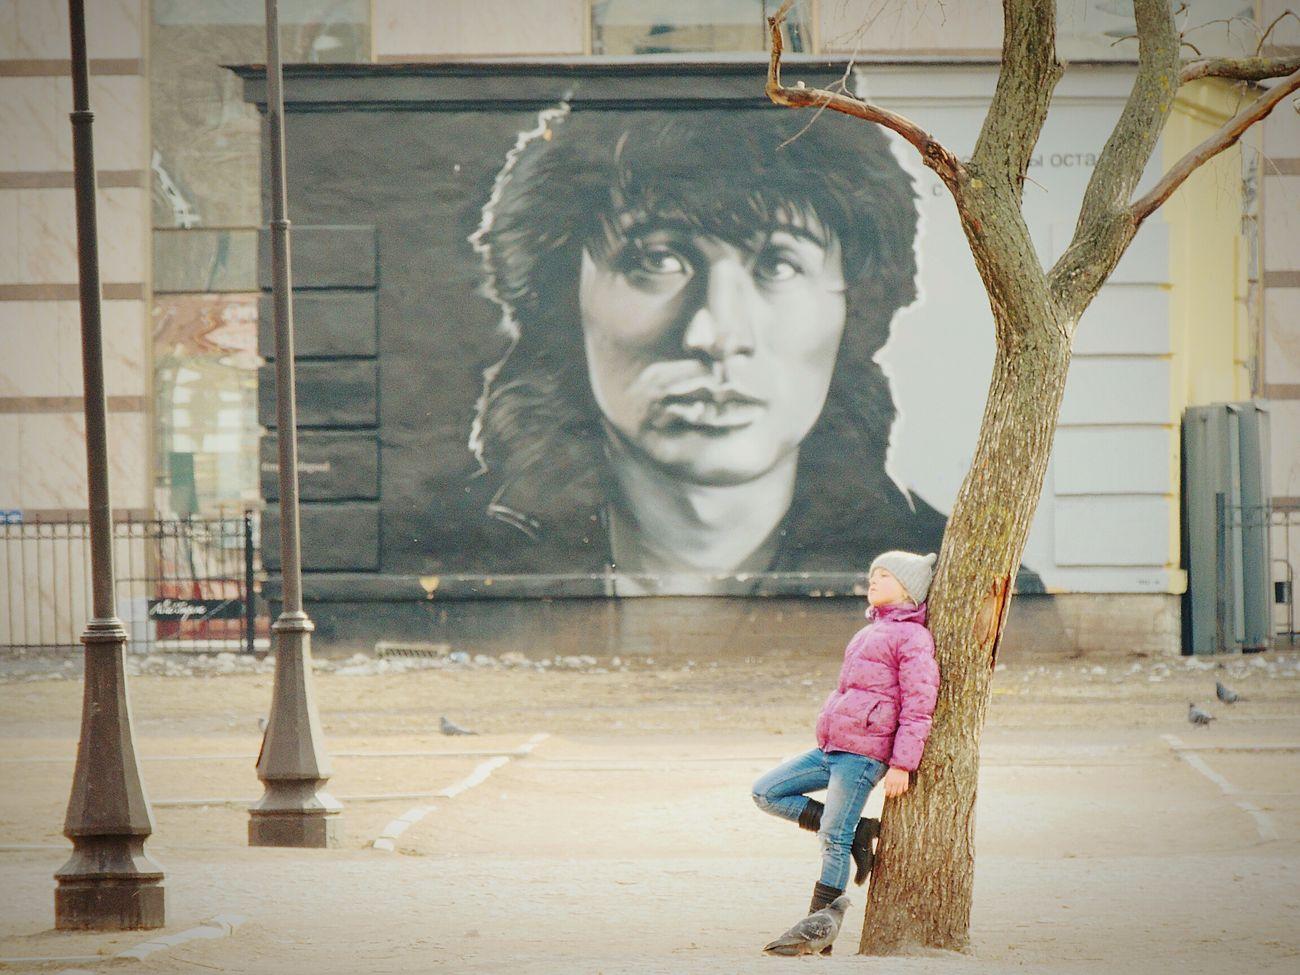 Kino Angelina Sankt-peterburg Central Rockstar Russia